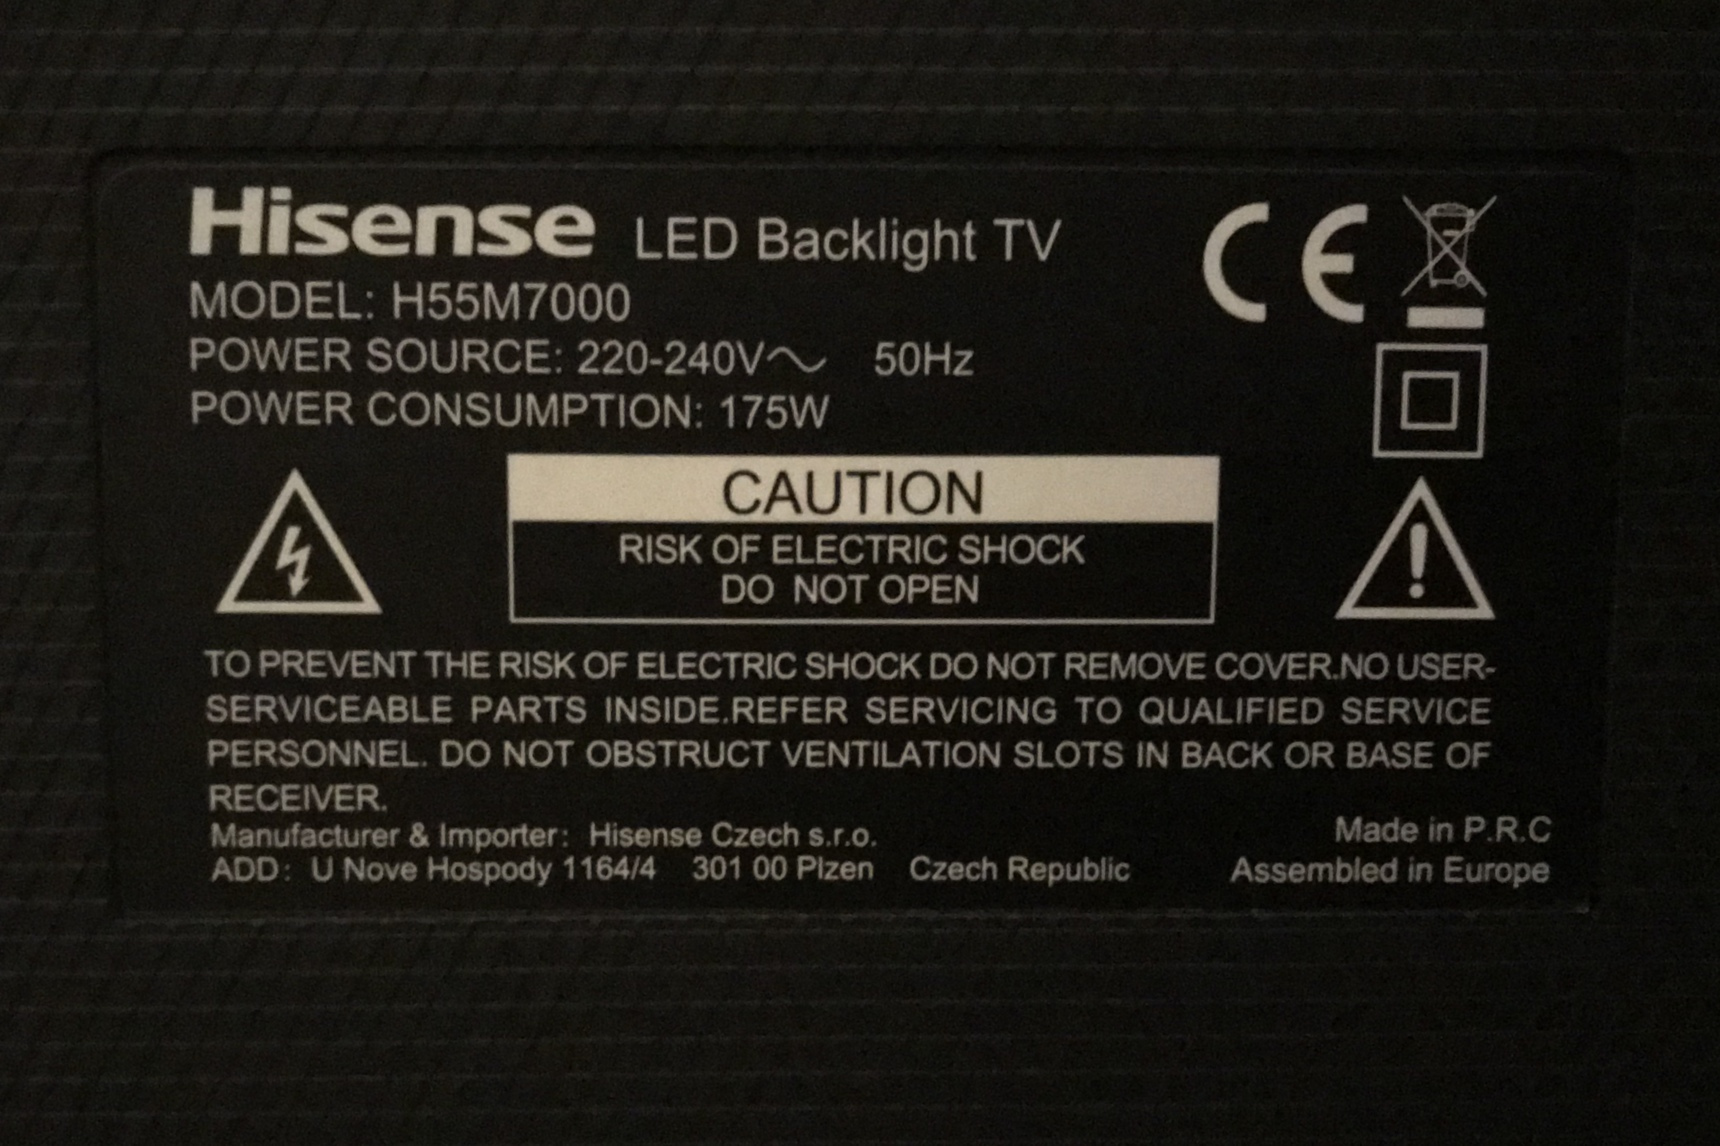 Hisense TVs (Discrete IR Codes attached) - Device Specific